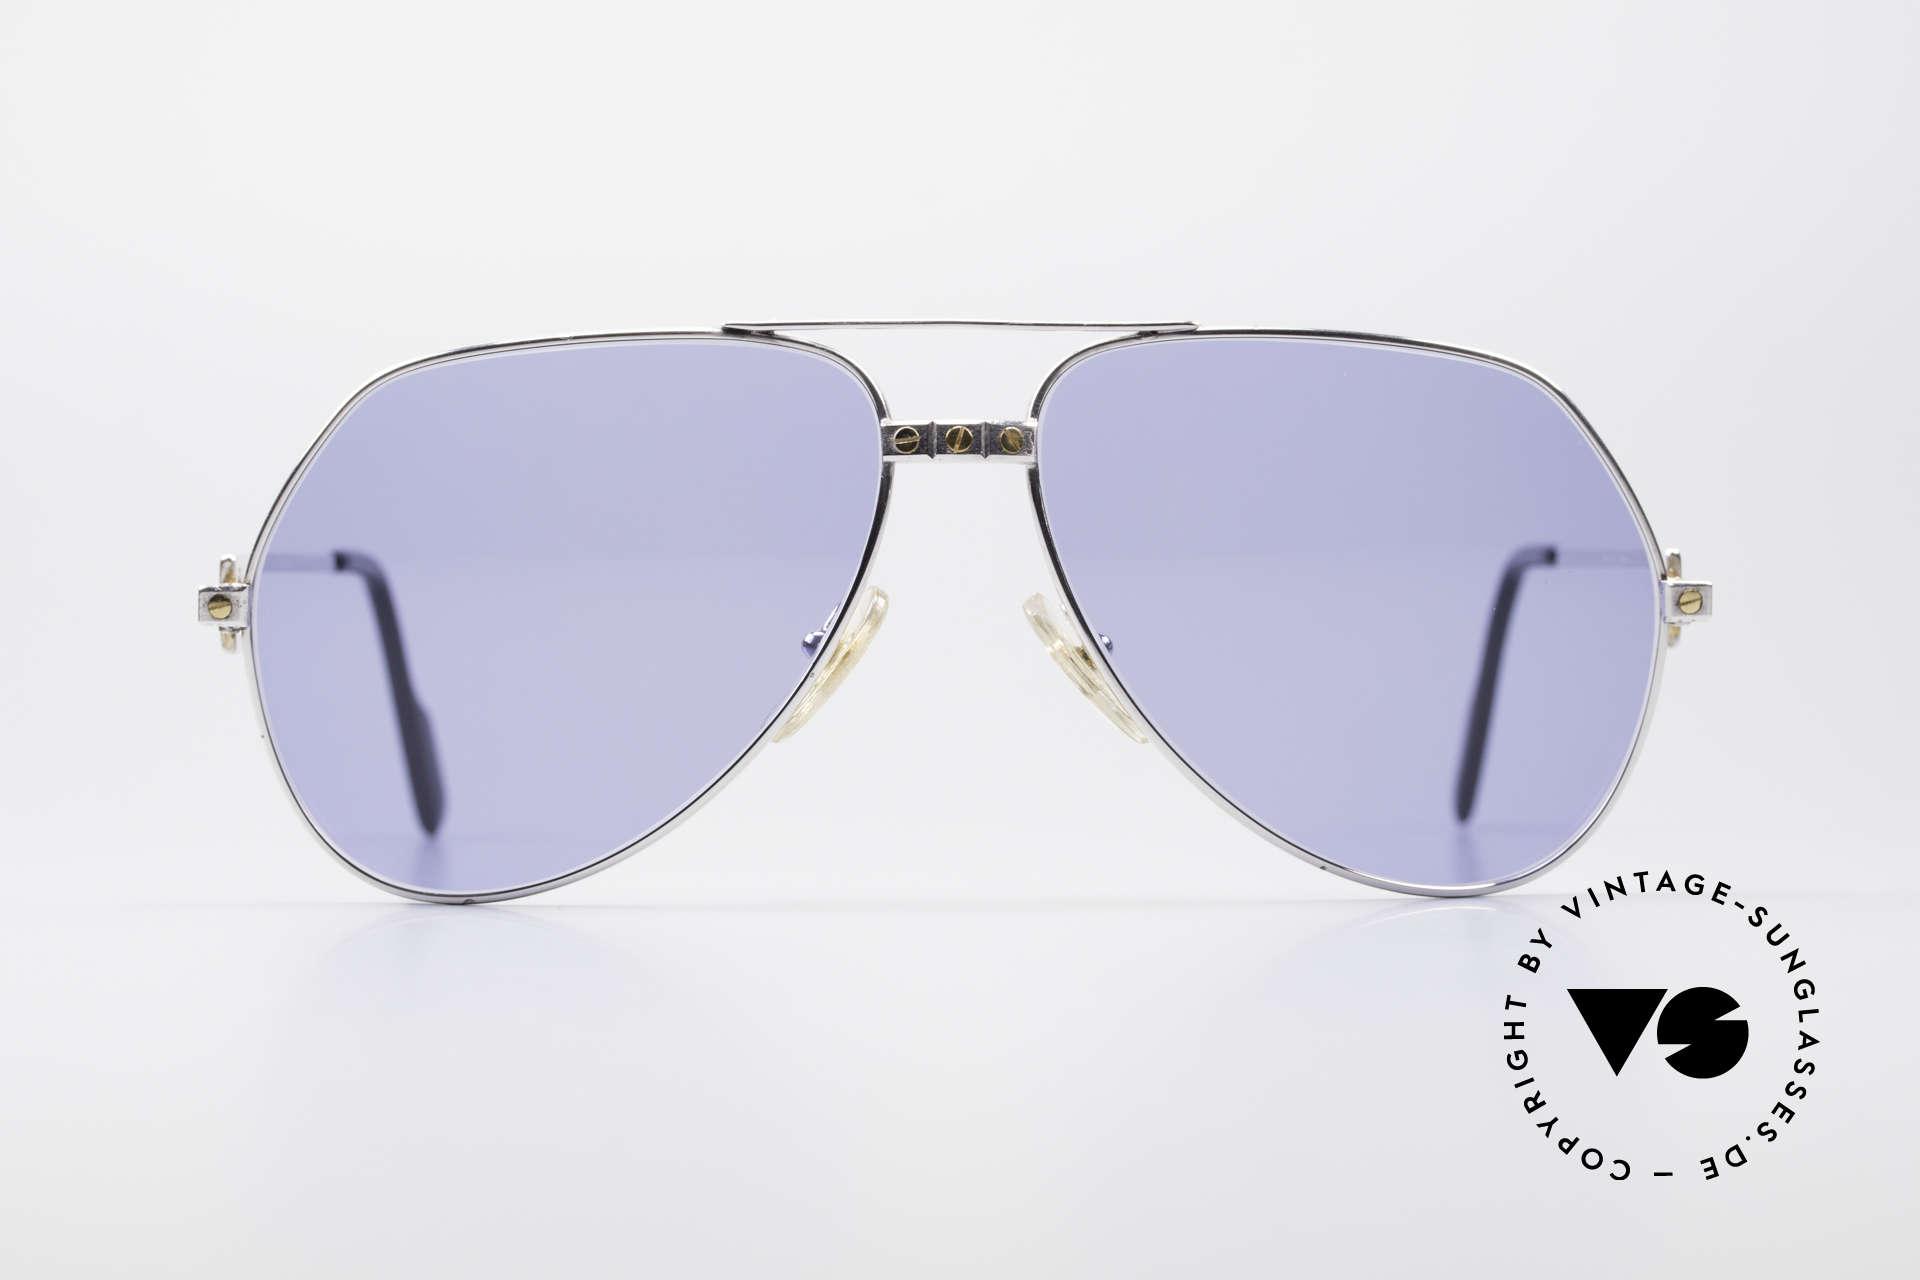 8b67017ca4f80 Sunglasses Cartier Vendome Santos - L Special Silver Edition ...